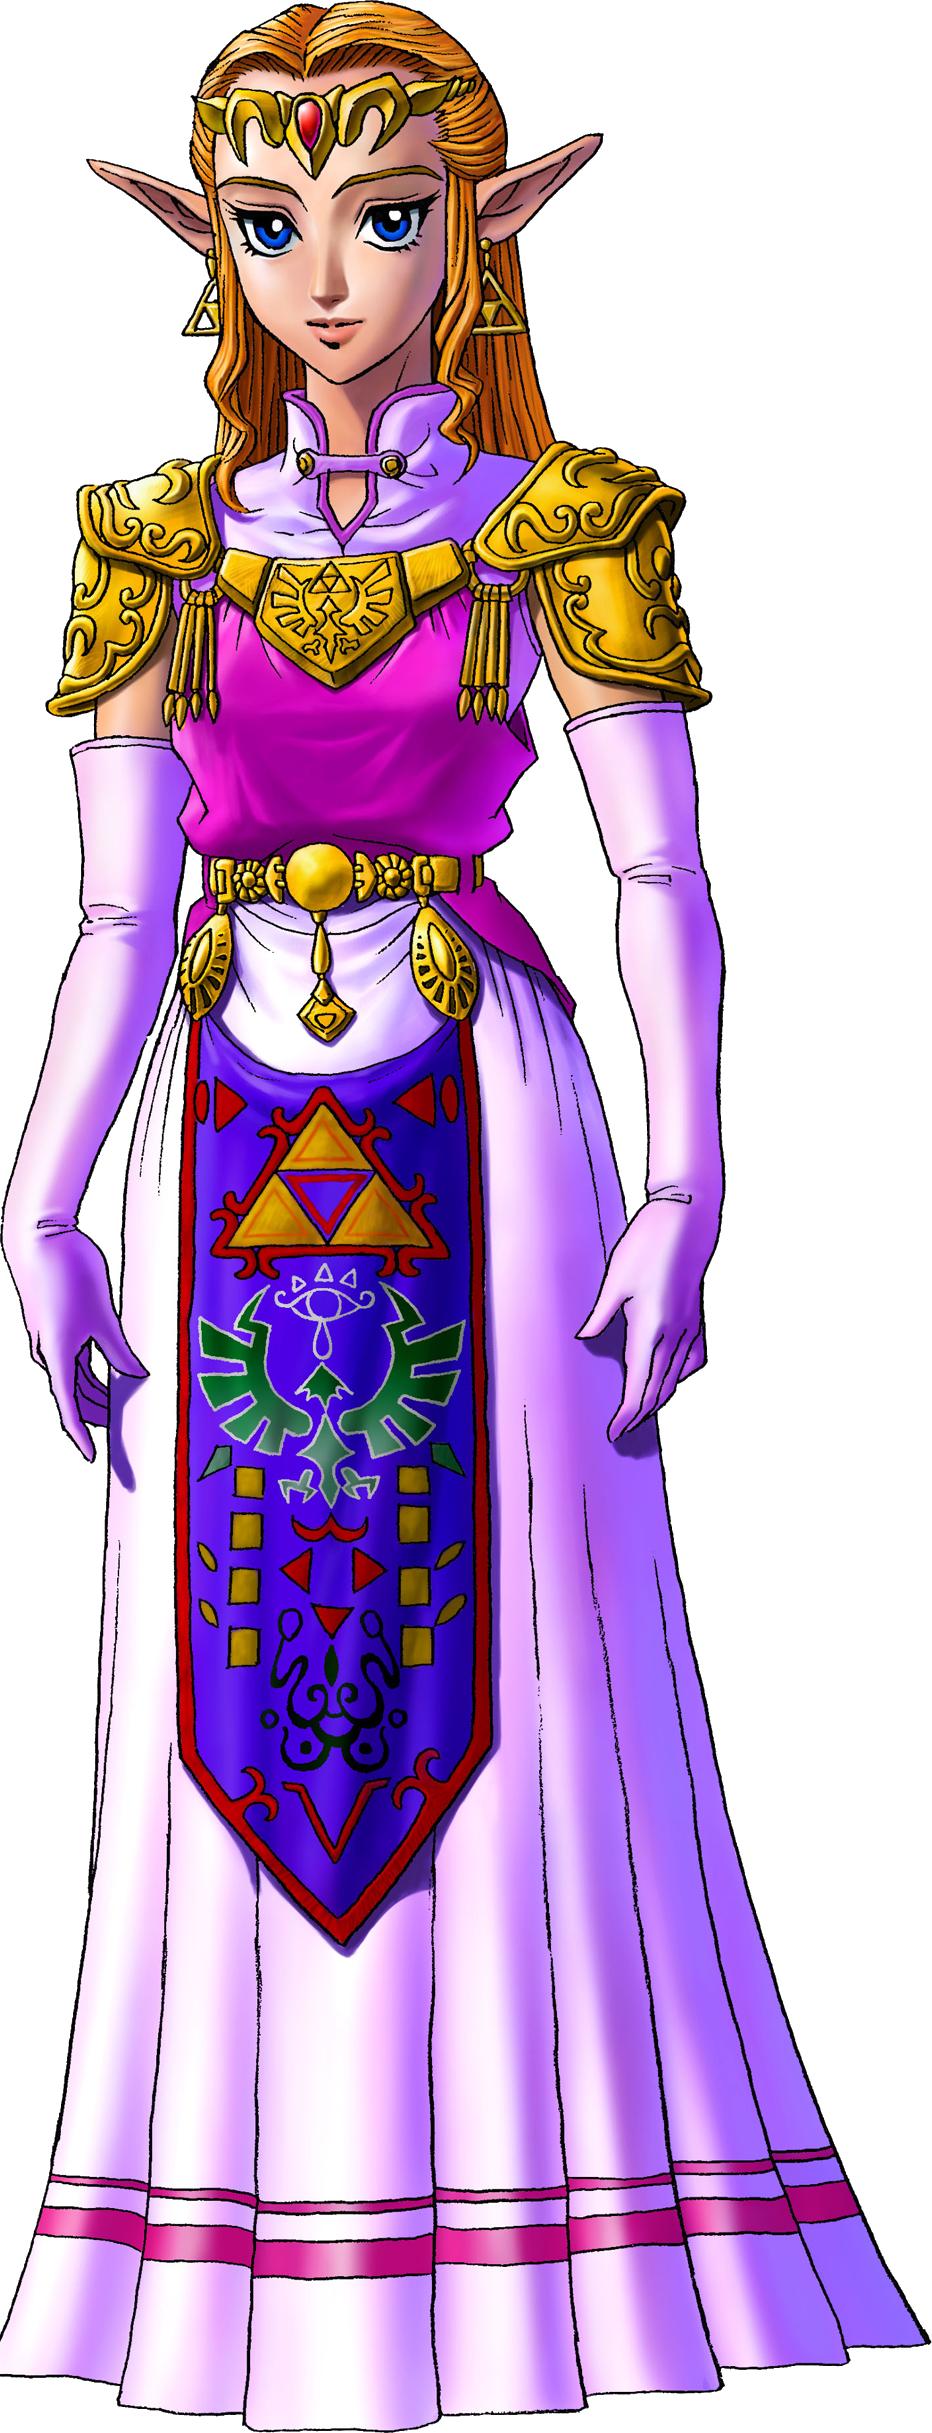 Saga Super Smash Bros. - Página 4 Adult_Princess_Zelda_%28Ocarina_of_Time%29